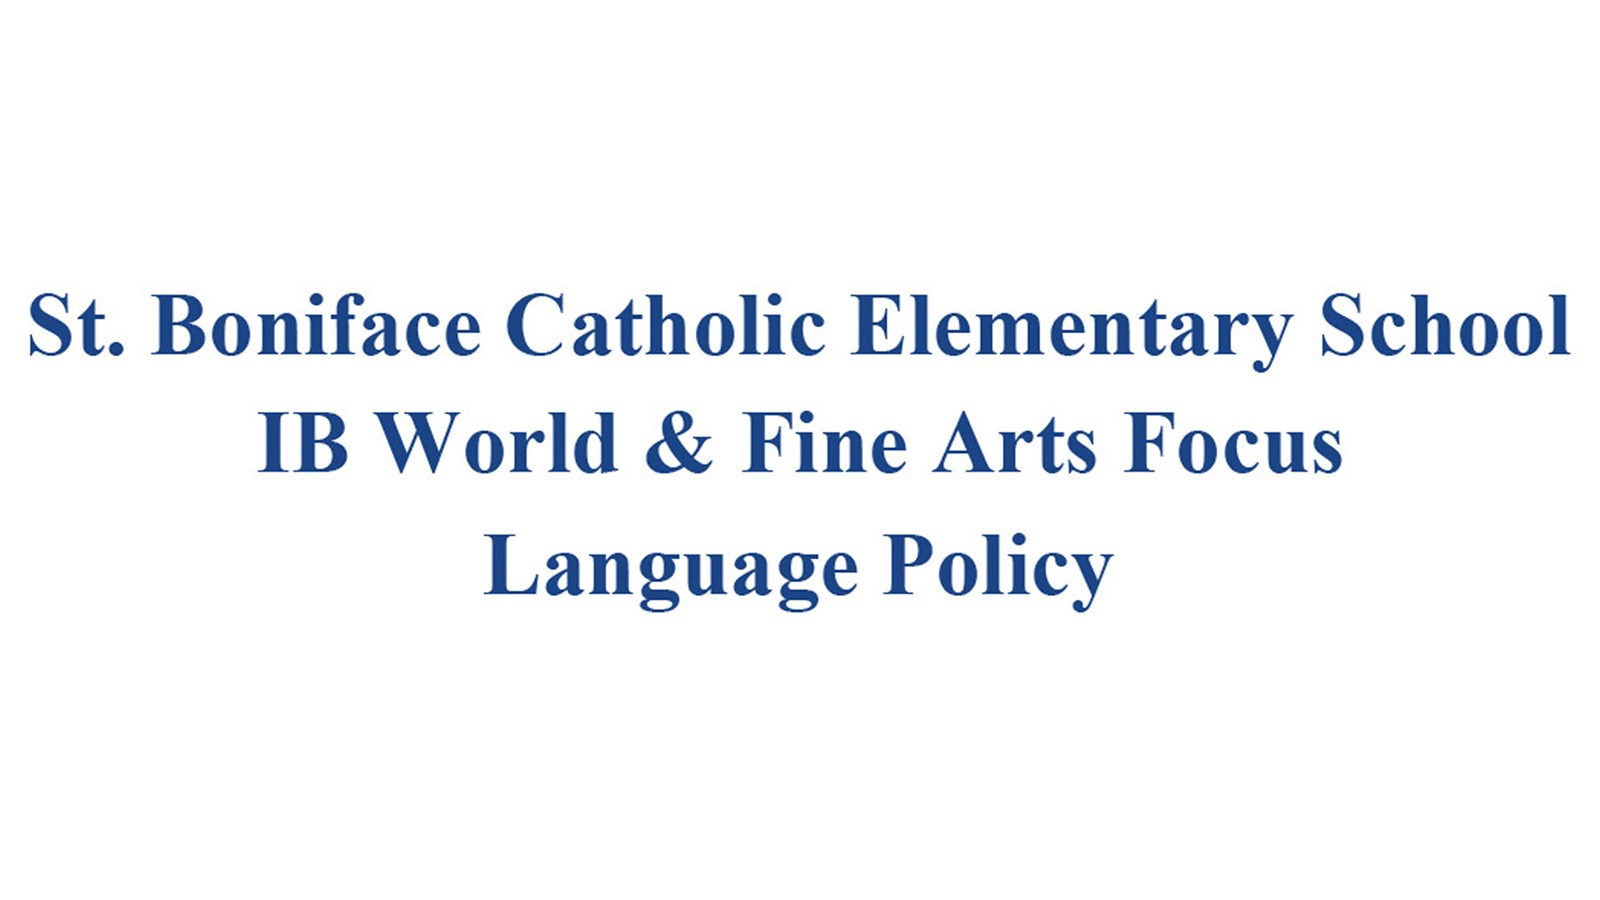 St. Boniface Language Policy Banner.jpg